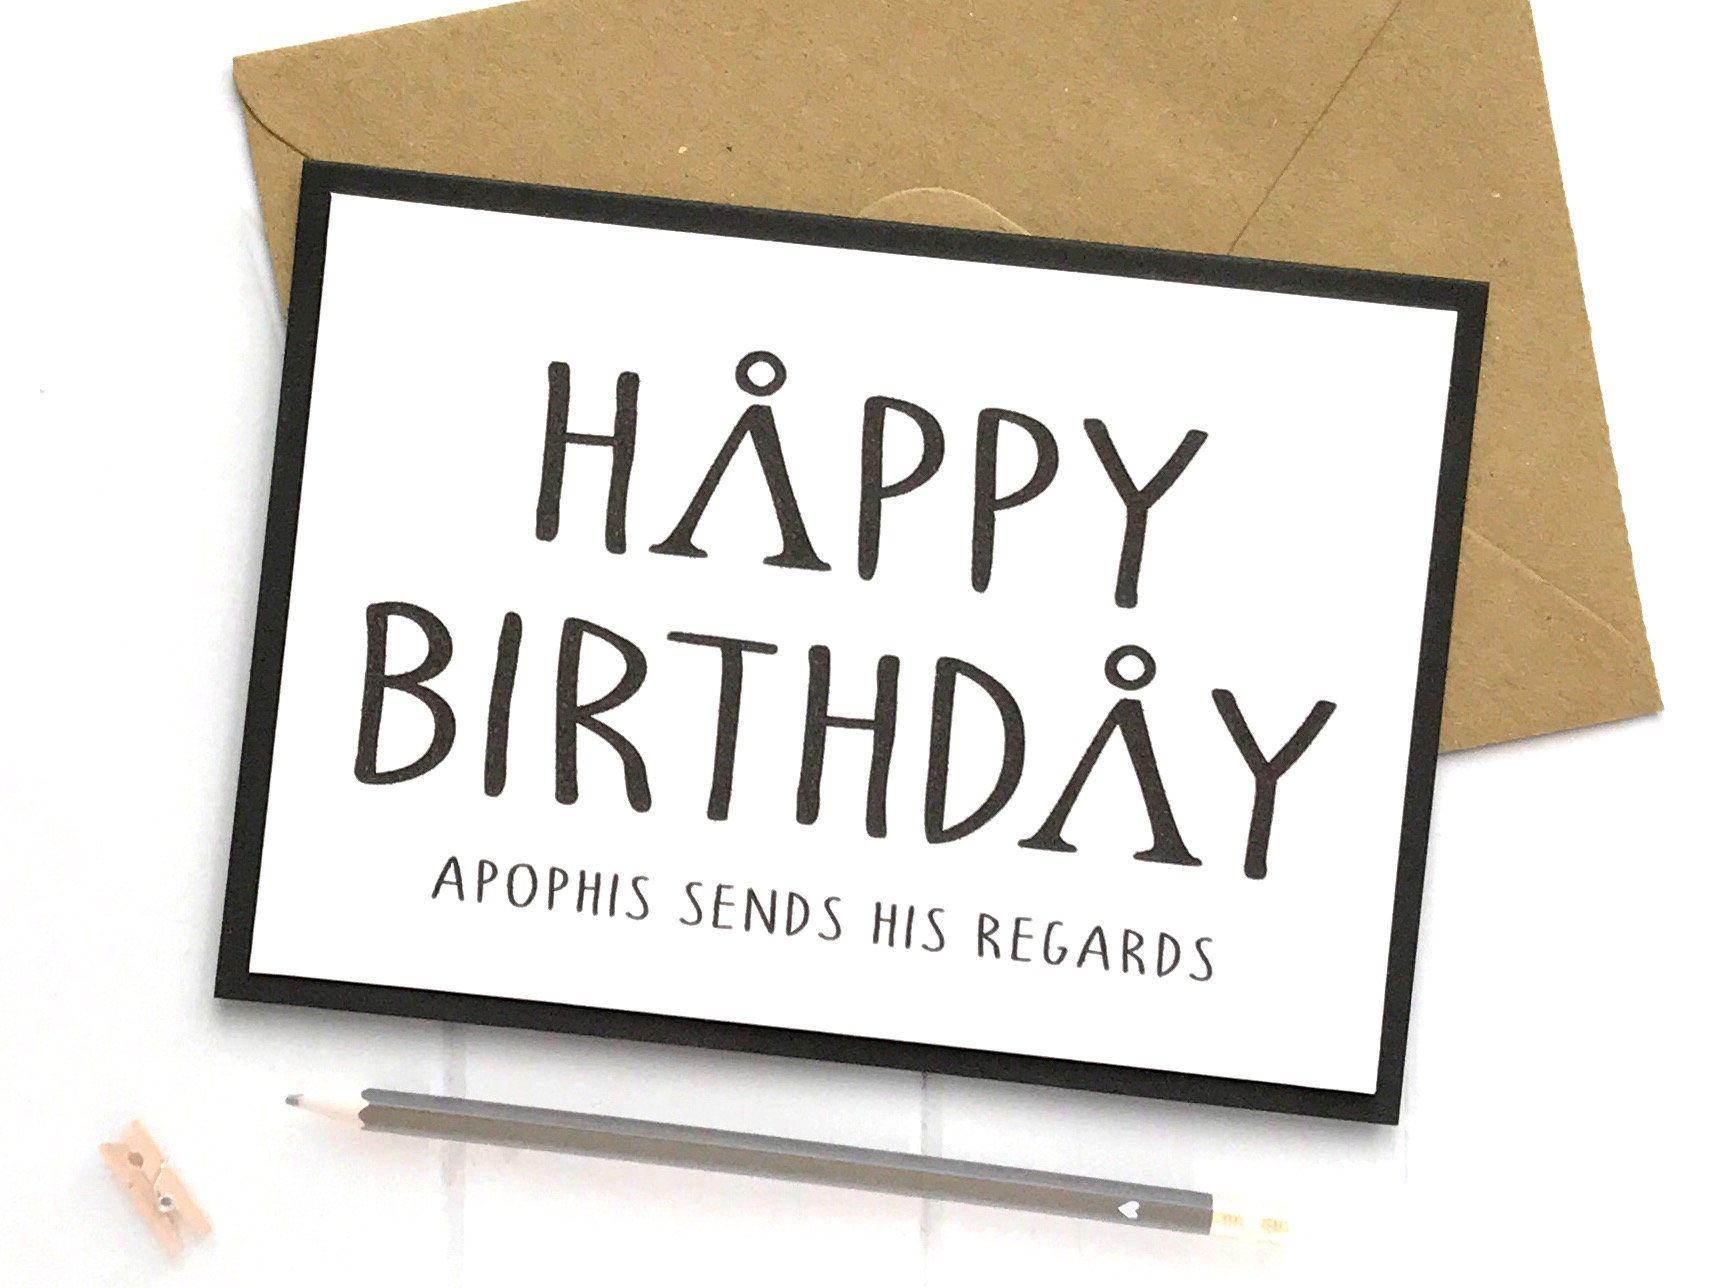 Share Joy Challenge Birthday Card Drawing Creative Birthday Cards Birthday Cards For Friends